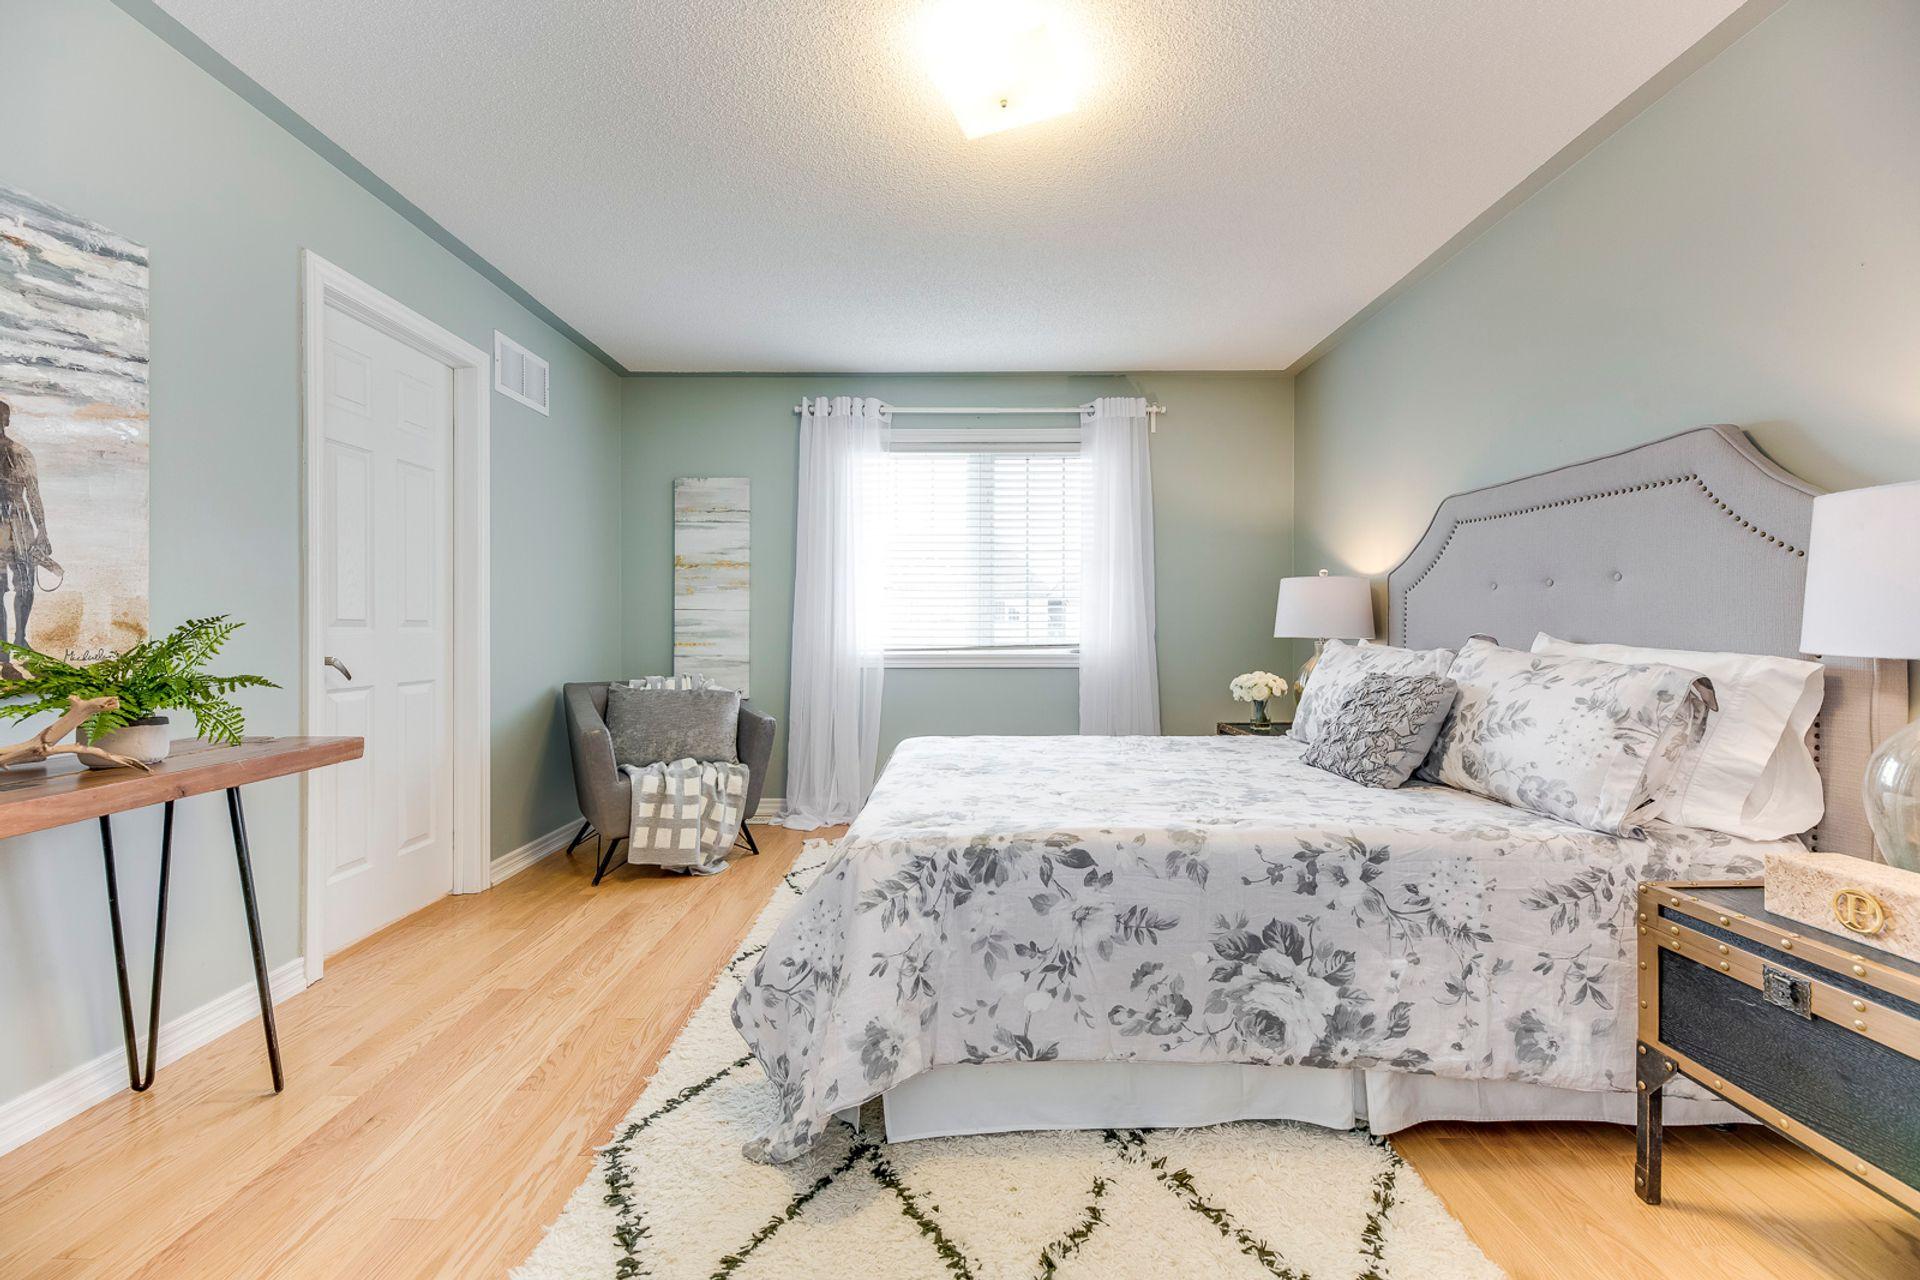 Primary Bedroom - 3720 Nightstar Dr, Mississauga - Elite3 & Team at 3720 Nightstar Drive, Churchill Meadows, Mississauga